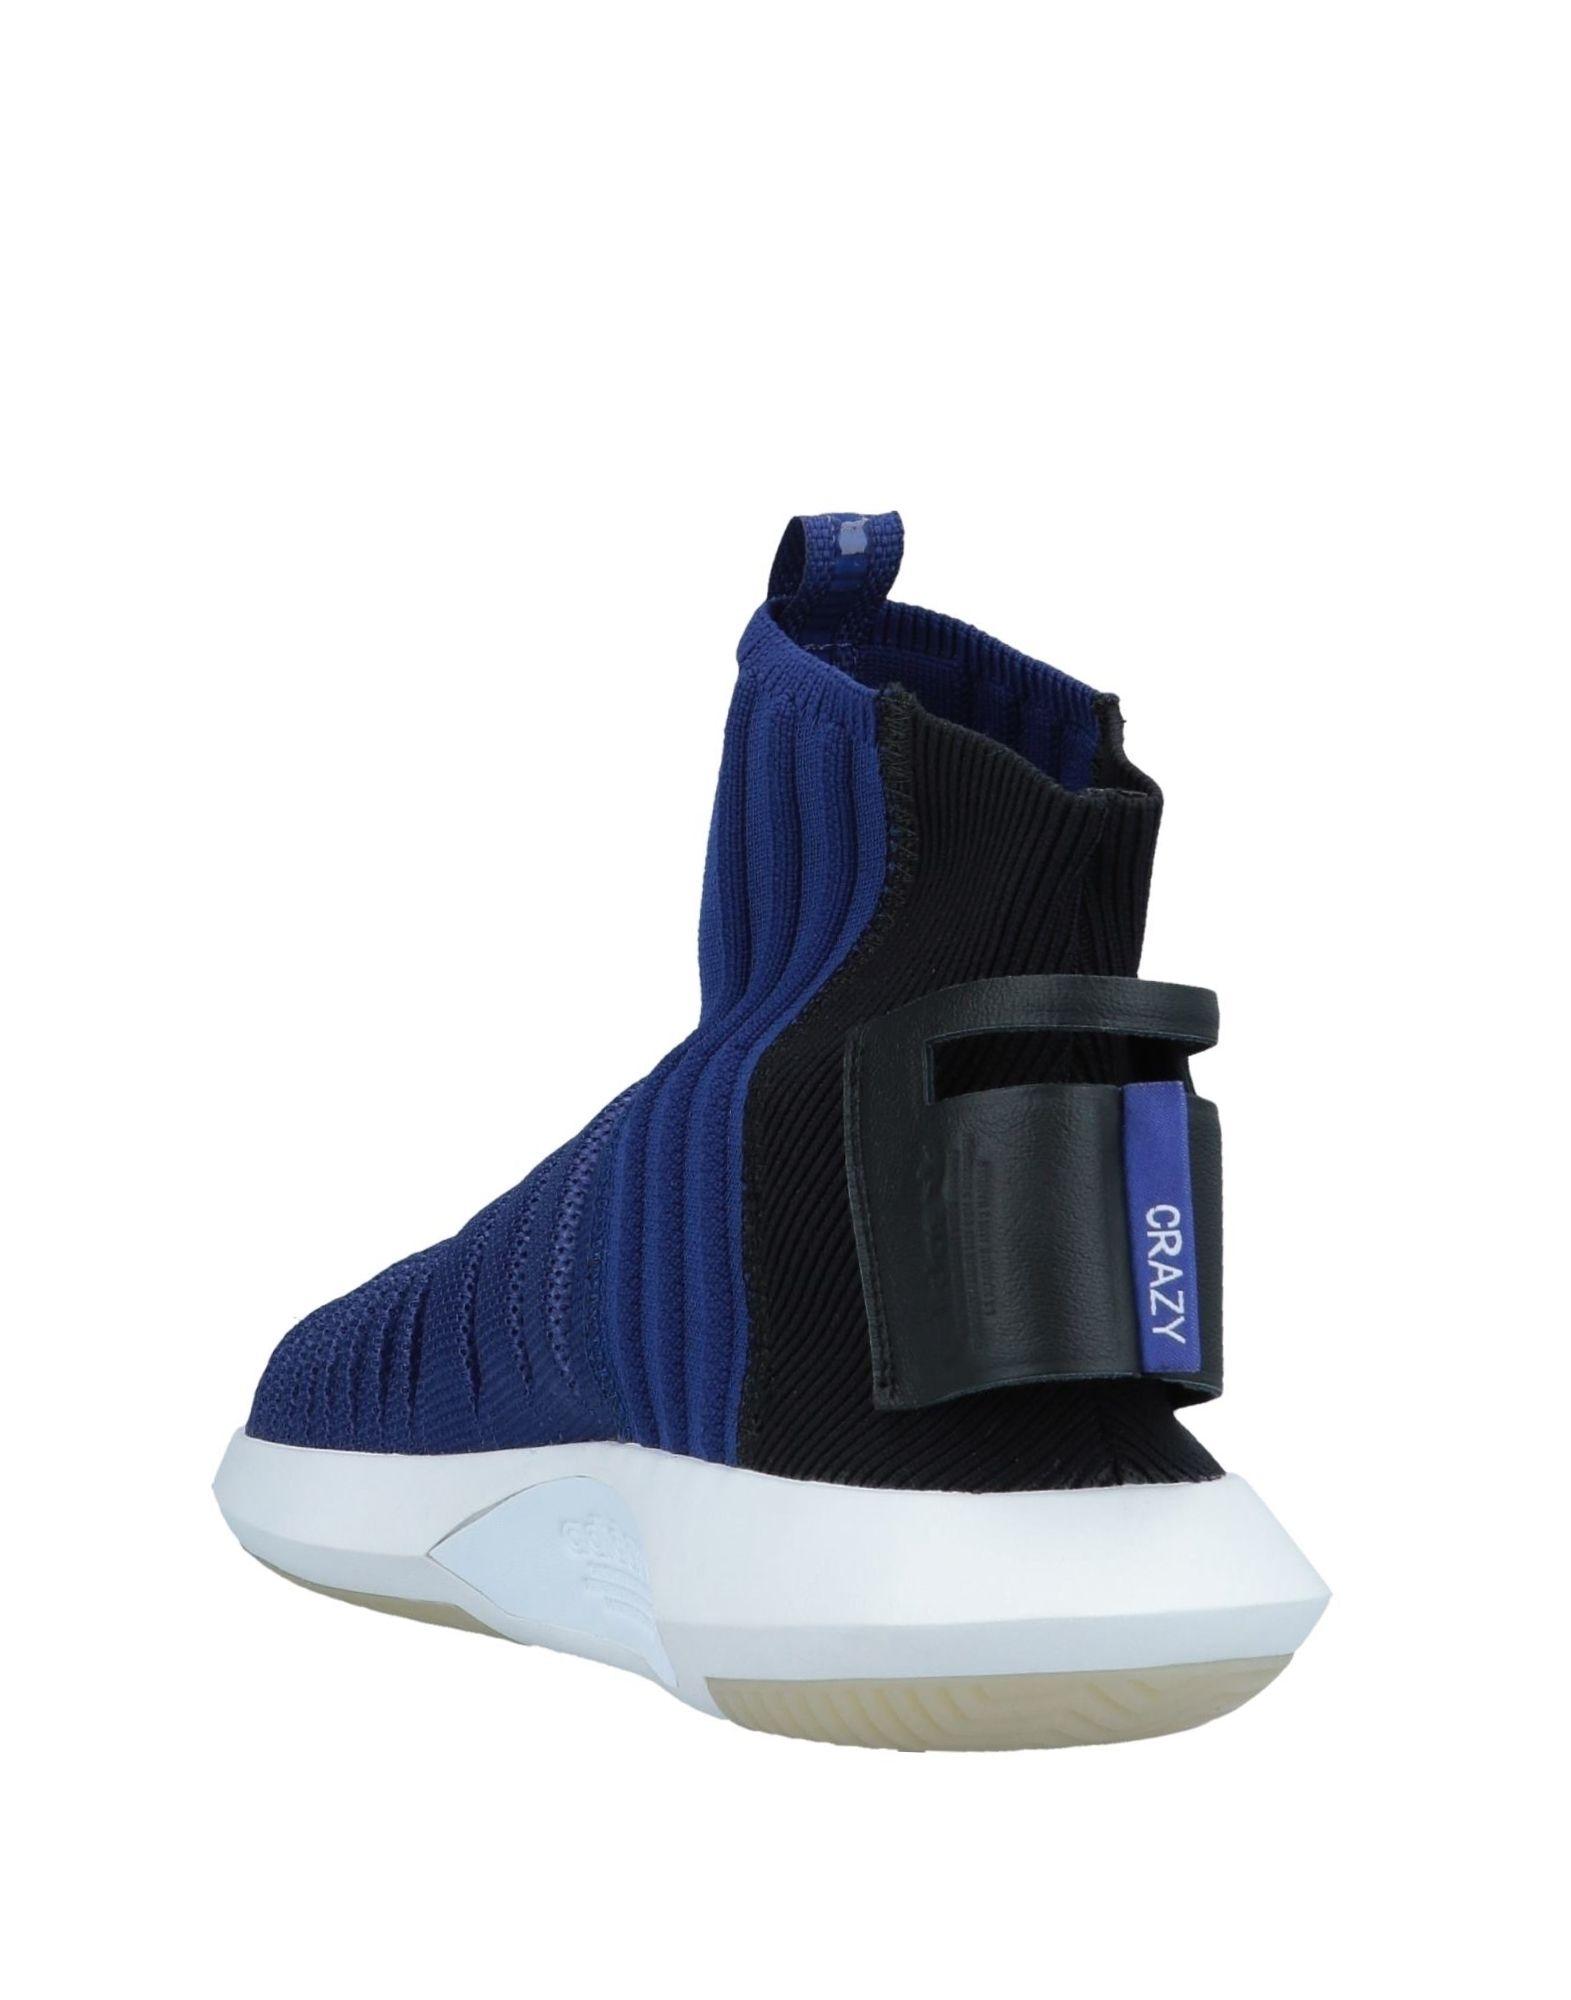 Rabatt echte Schuhe Turnschuhes Adidas Originals Turnschuhes Schuhe Herren 11586551LW 937253